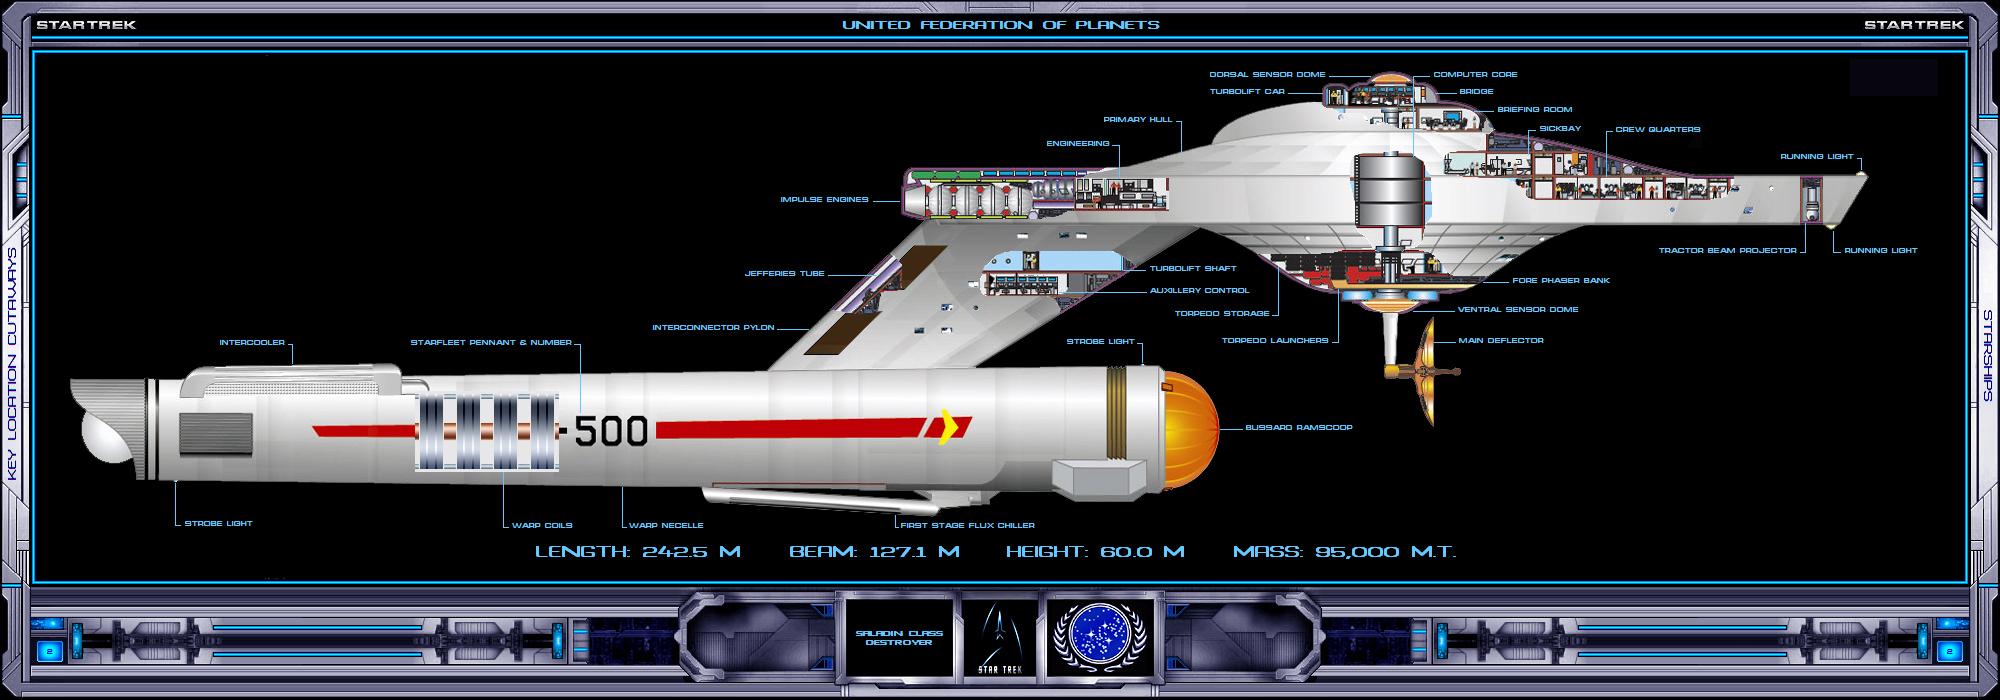 Saladin class cutaway by iankeenan d3btwqy